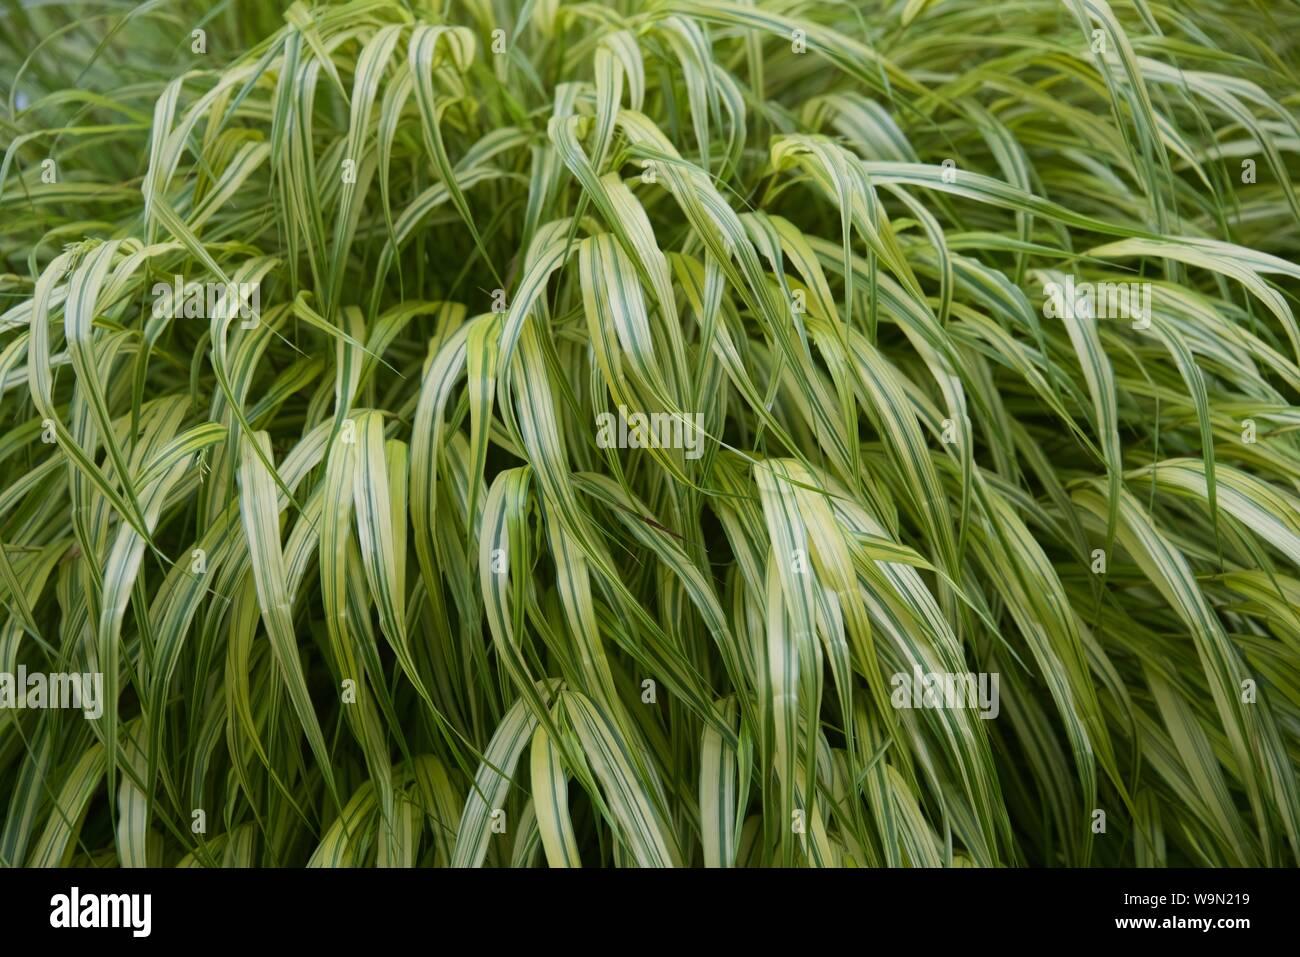 Japanese Forest Grass (hakonechloa macra aureola) a single plant filling the frame Stock Photo